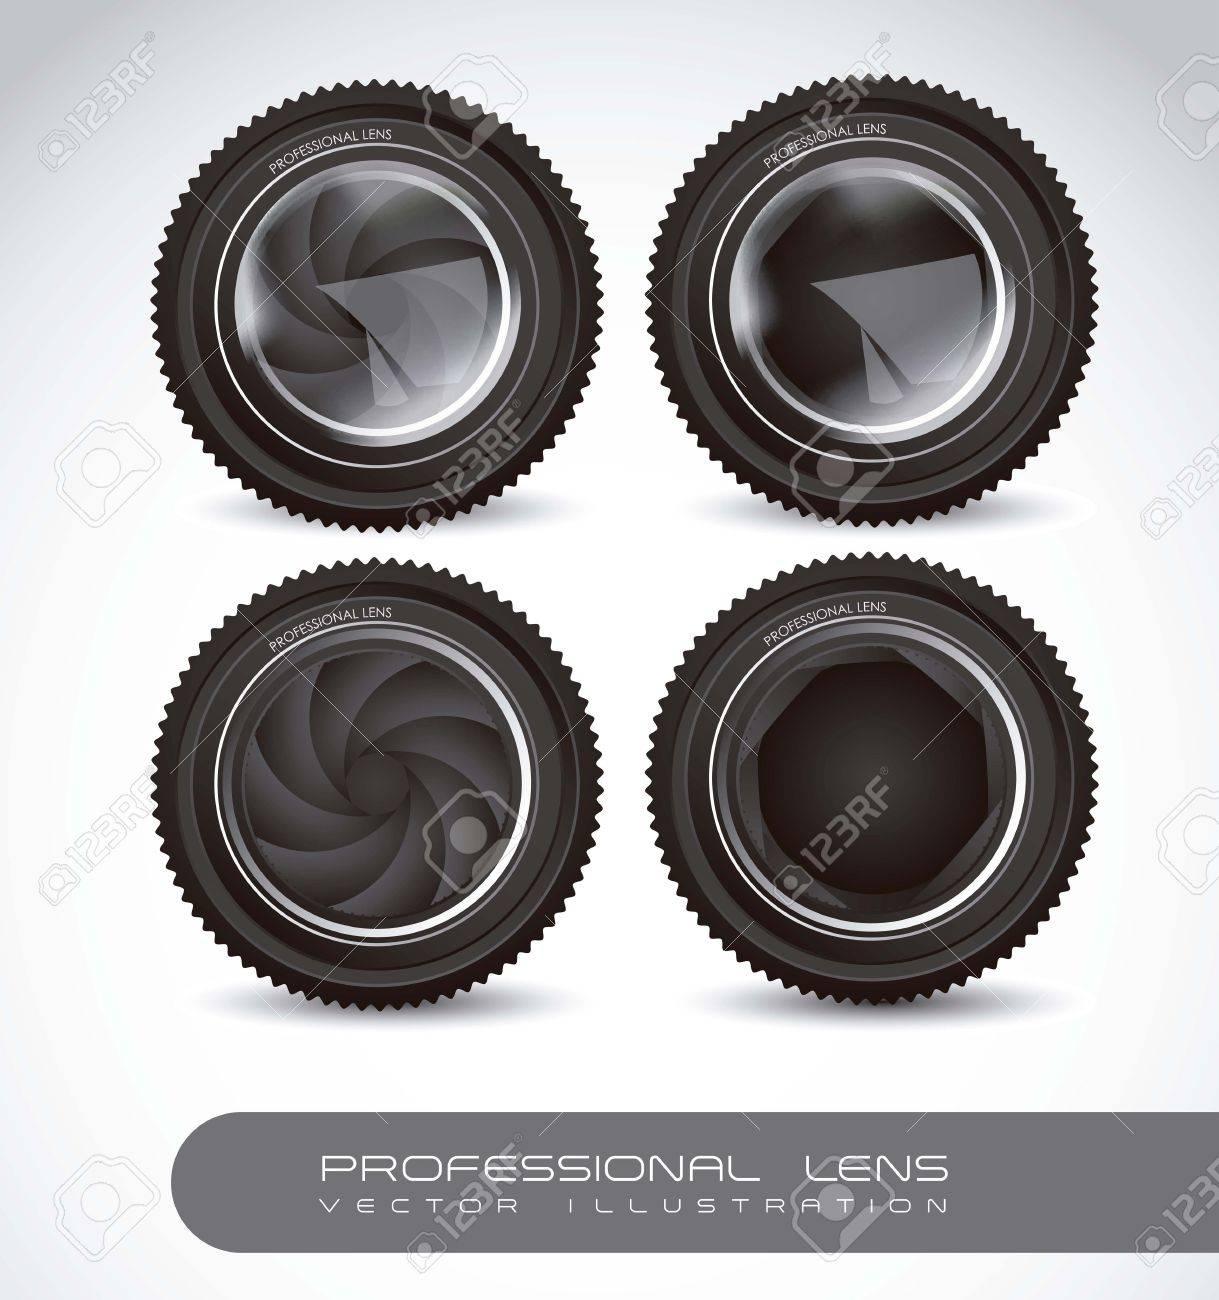 Illustration of camera lens isolated on white background,  illustration Stock Vector - 15191218